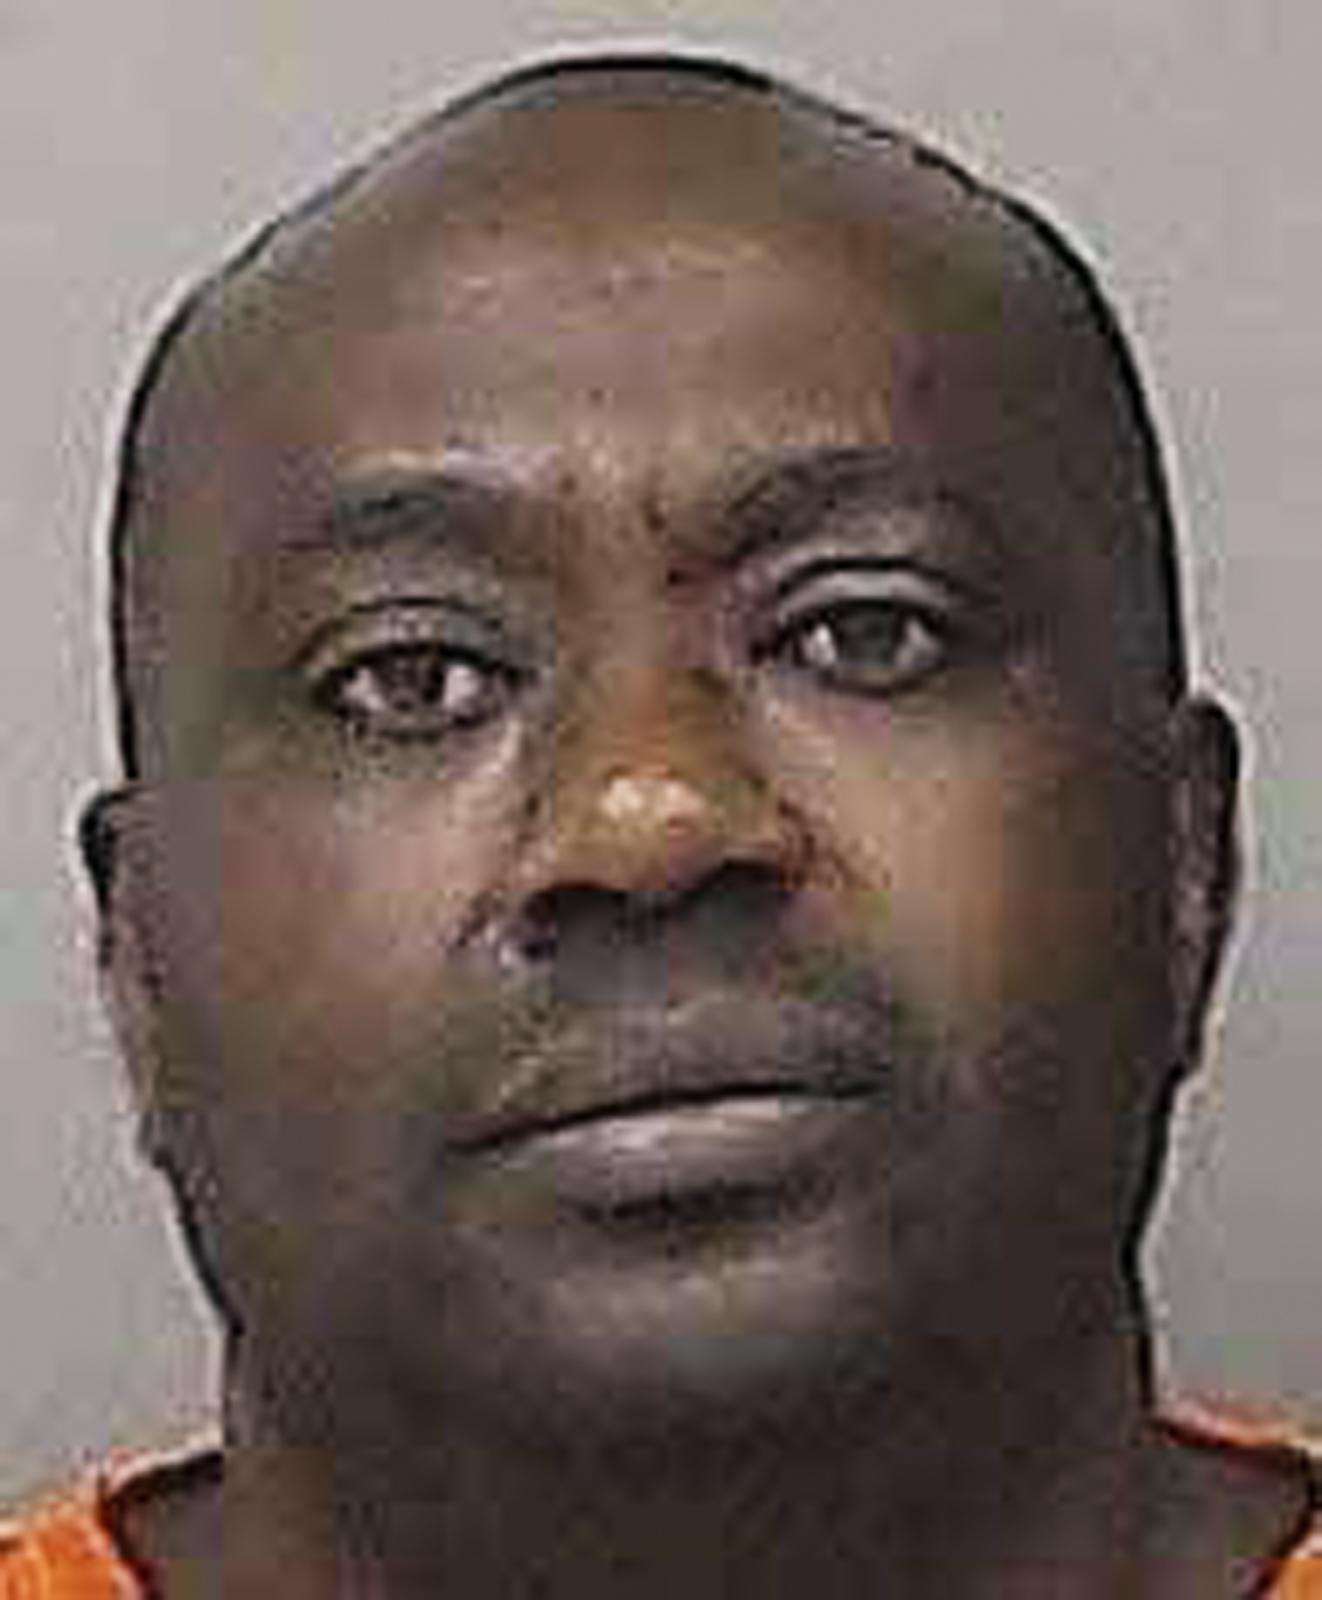 Gervais Ngombwa. (Linn County Jail via AP)